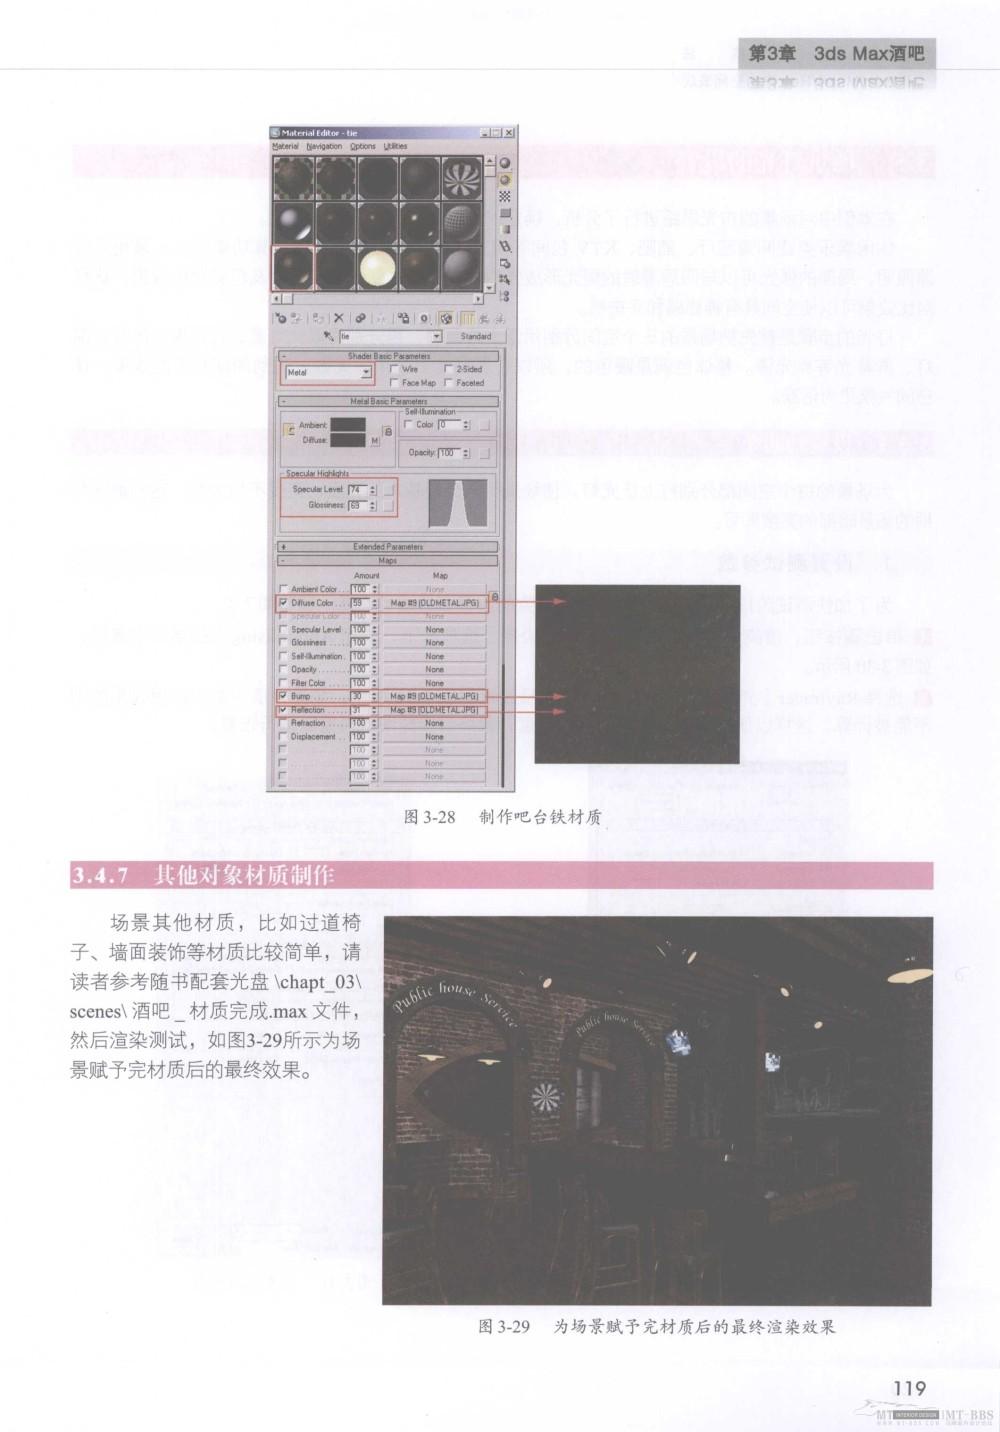 水晶石技法-3ds_Max&VRay室内空间表现_水晶石技法-3ds_Max&VRay室内空间表现_页面_125.jpg